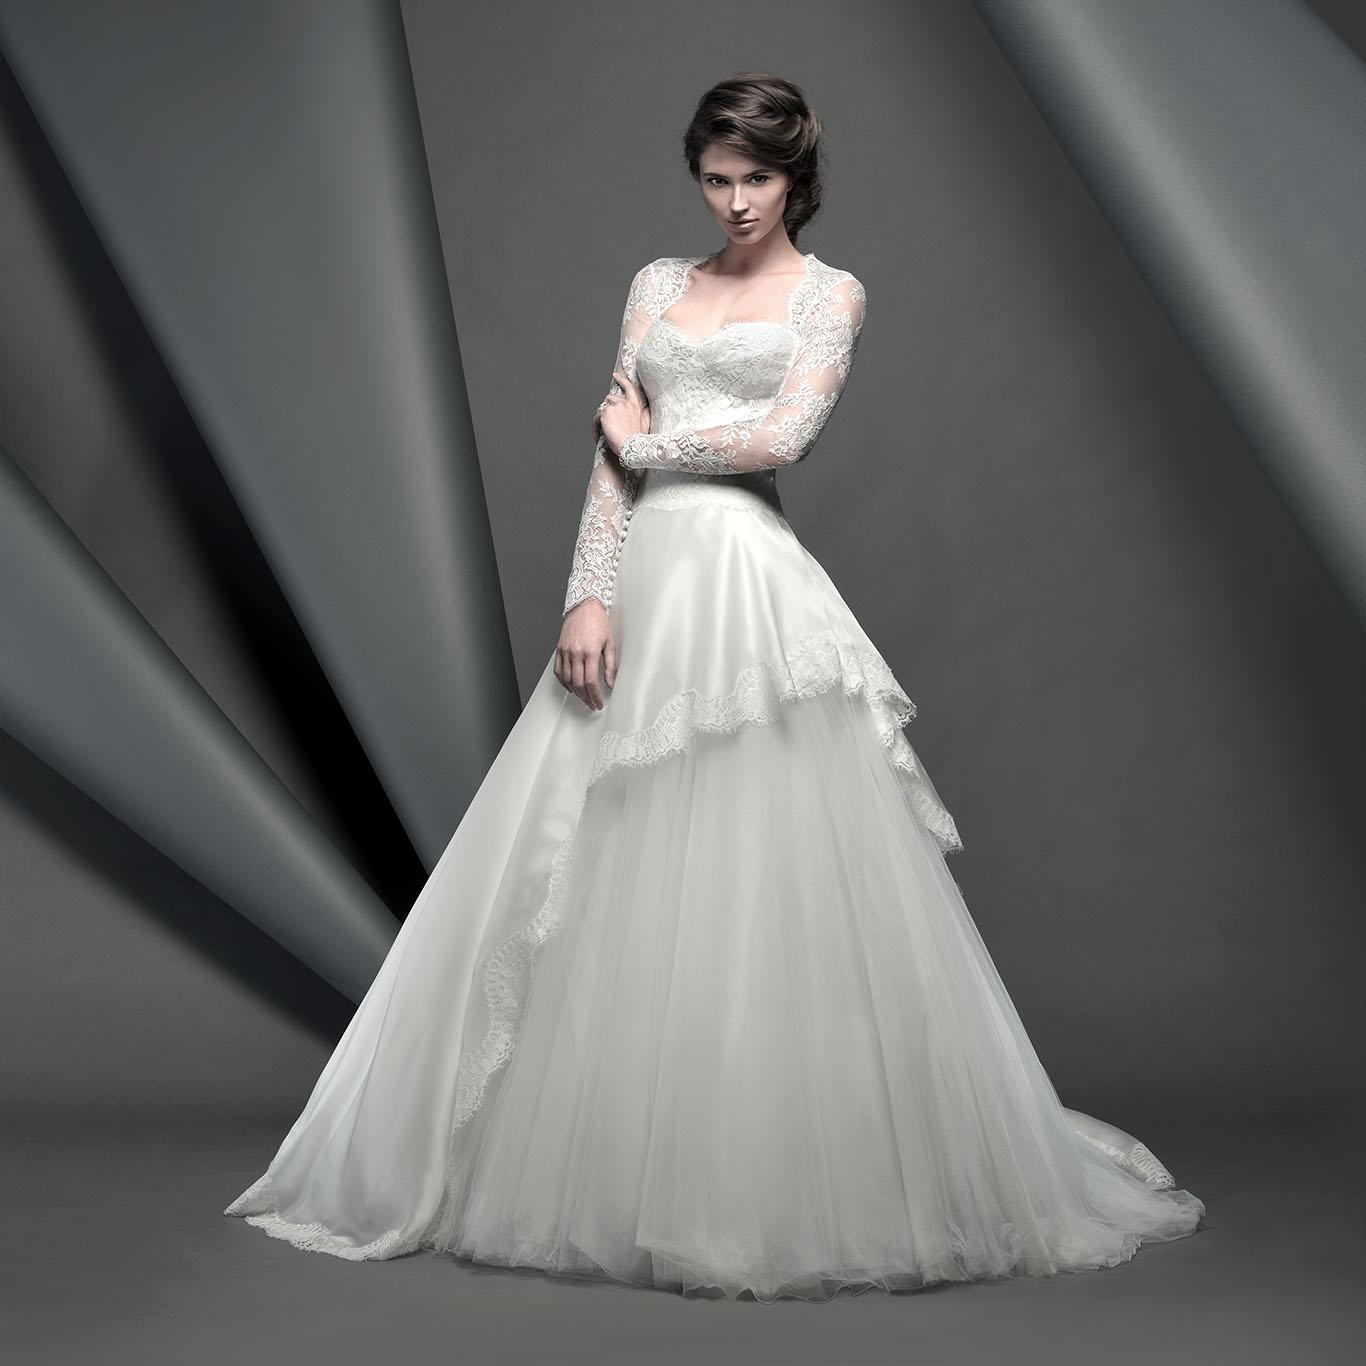 Real Brides Suzanne Neville: Novello Collection 2015